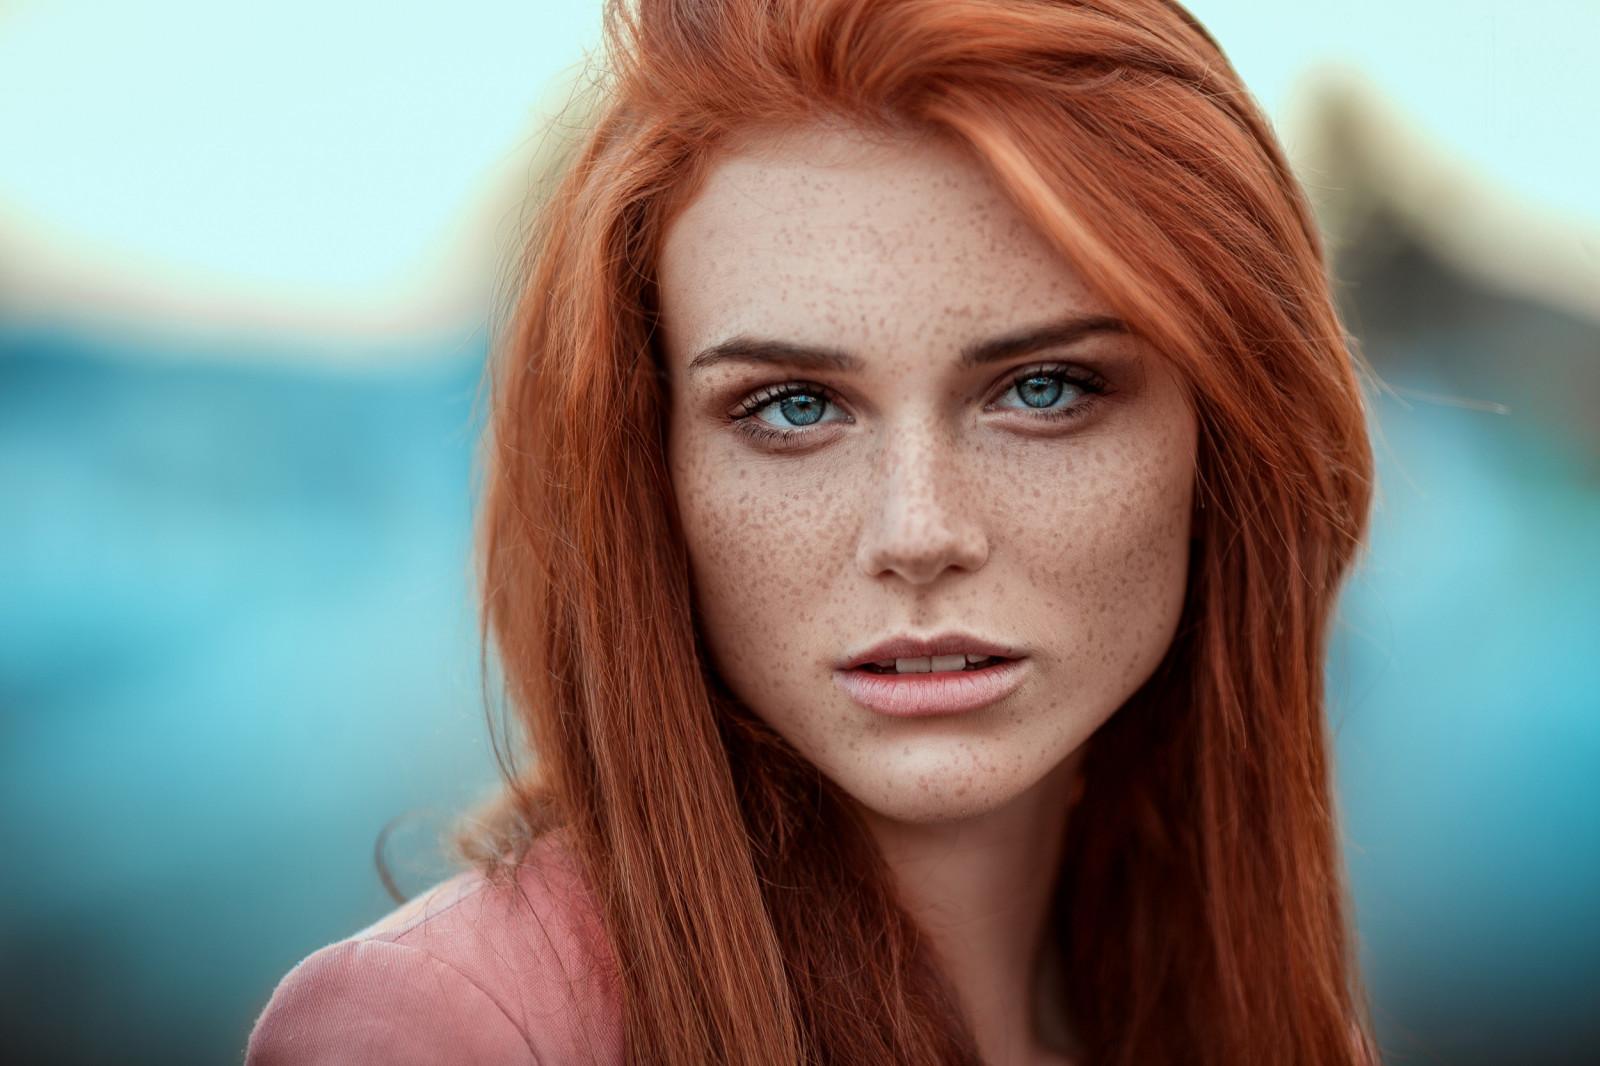 wallpaper face women redhead model depth of field. Black Bedroom Furniture Sets. Home Design Ideas